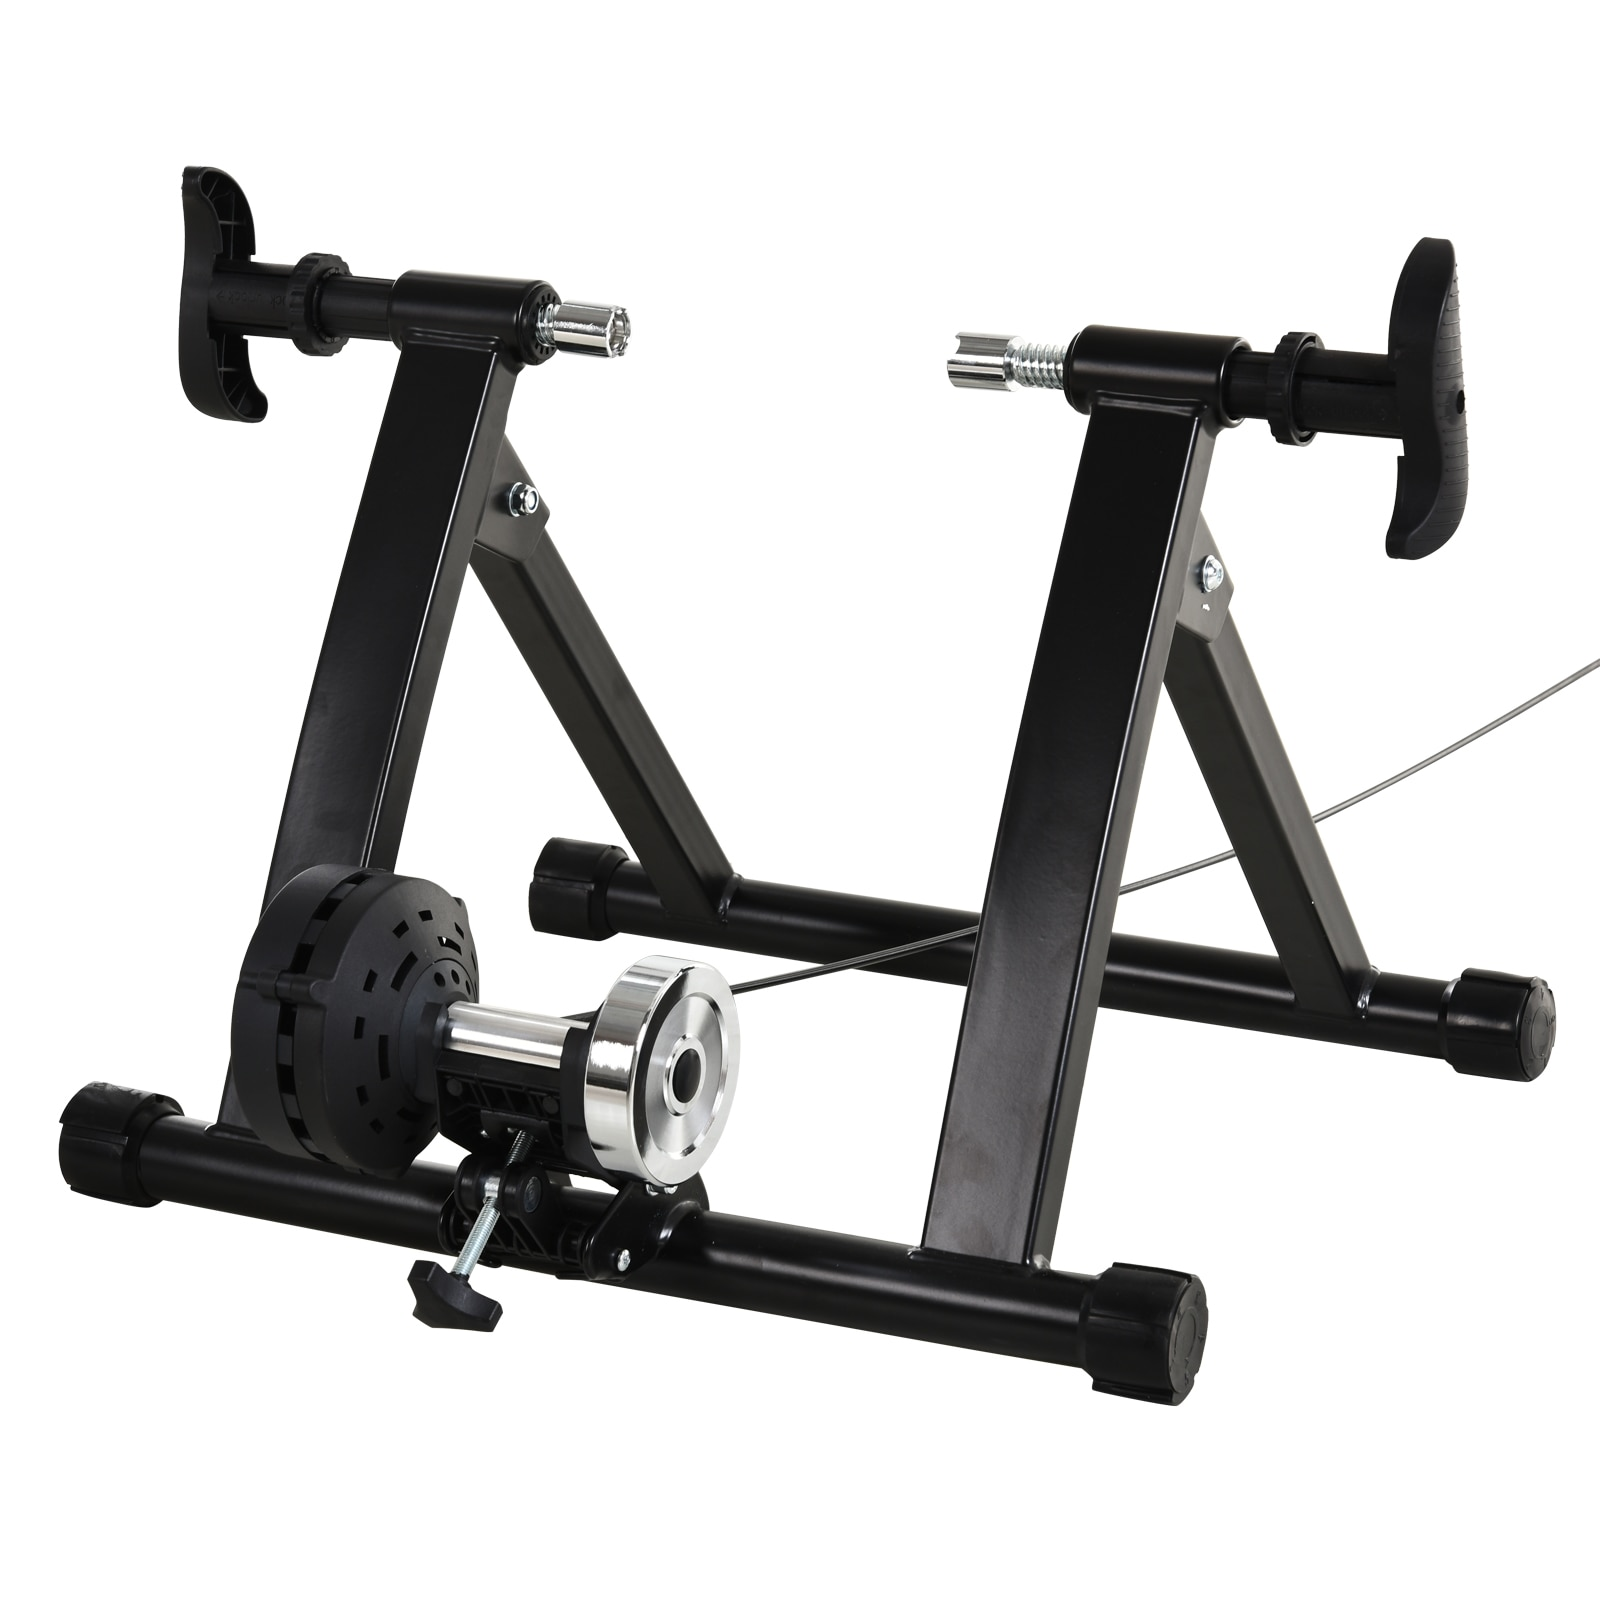 Bike roller with 8 levels resistance domestic training bike trainer exercise folding steel 120kg Black